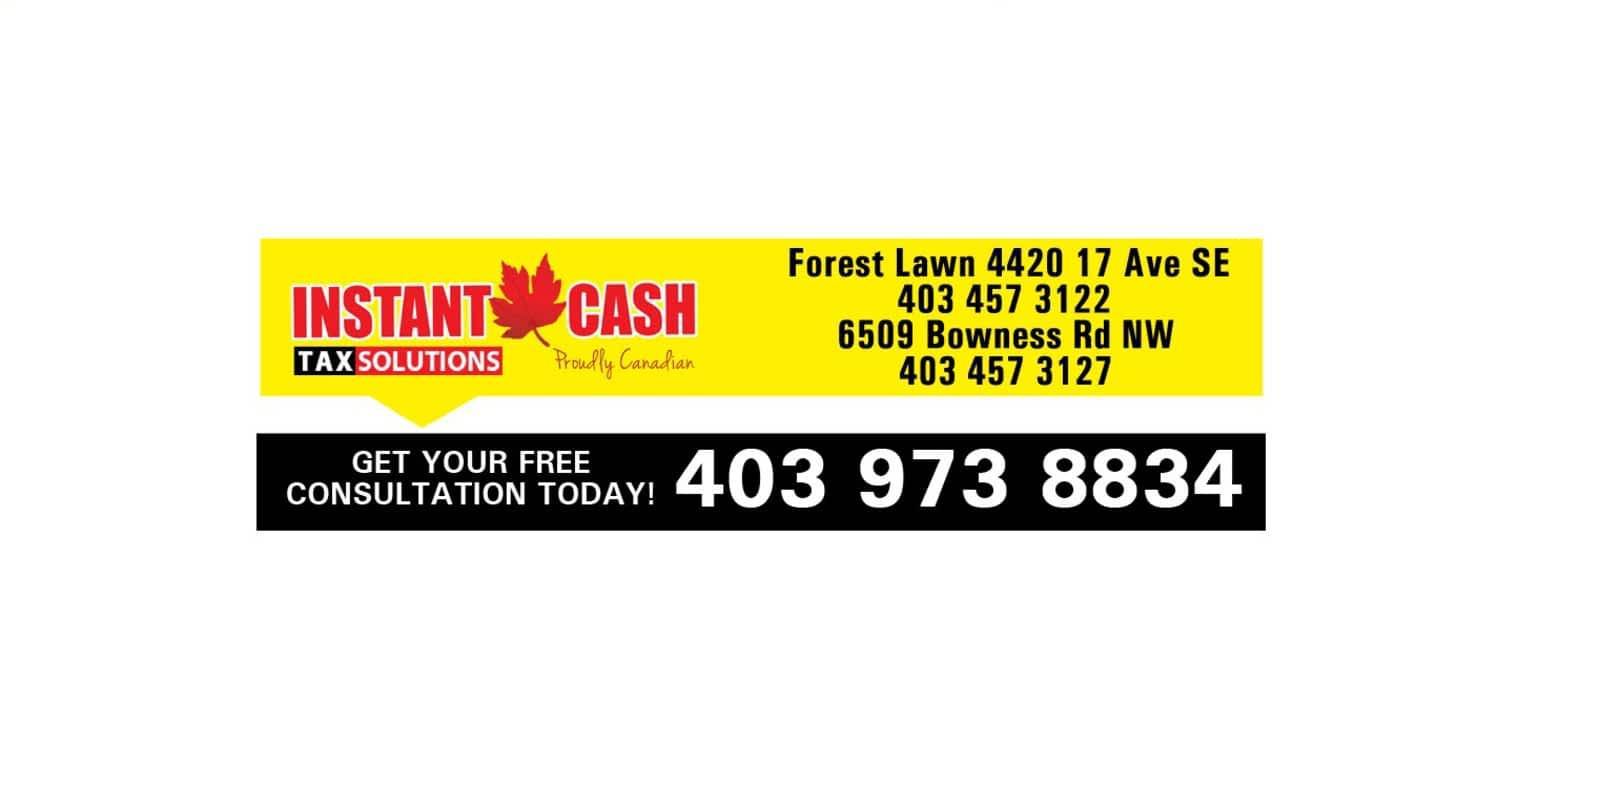 CashCentral.com Installment Loans